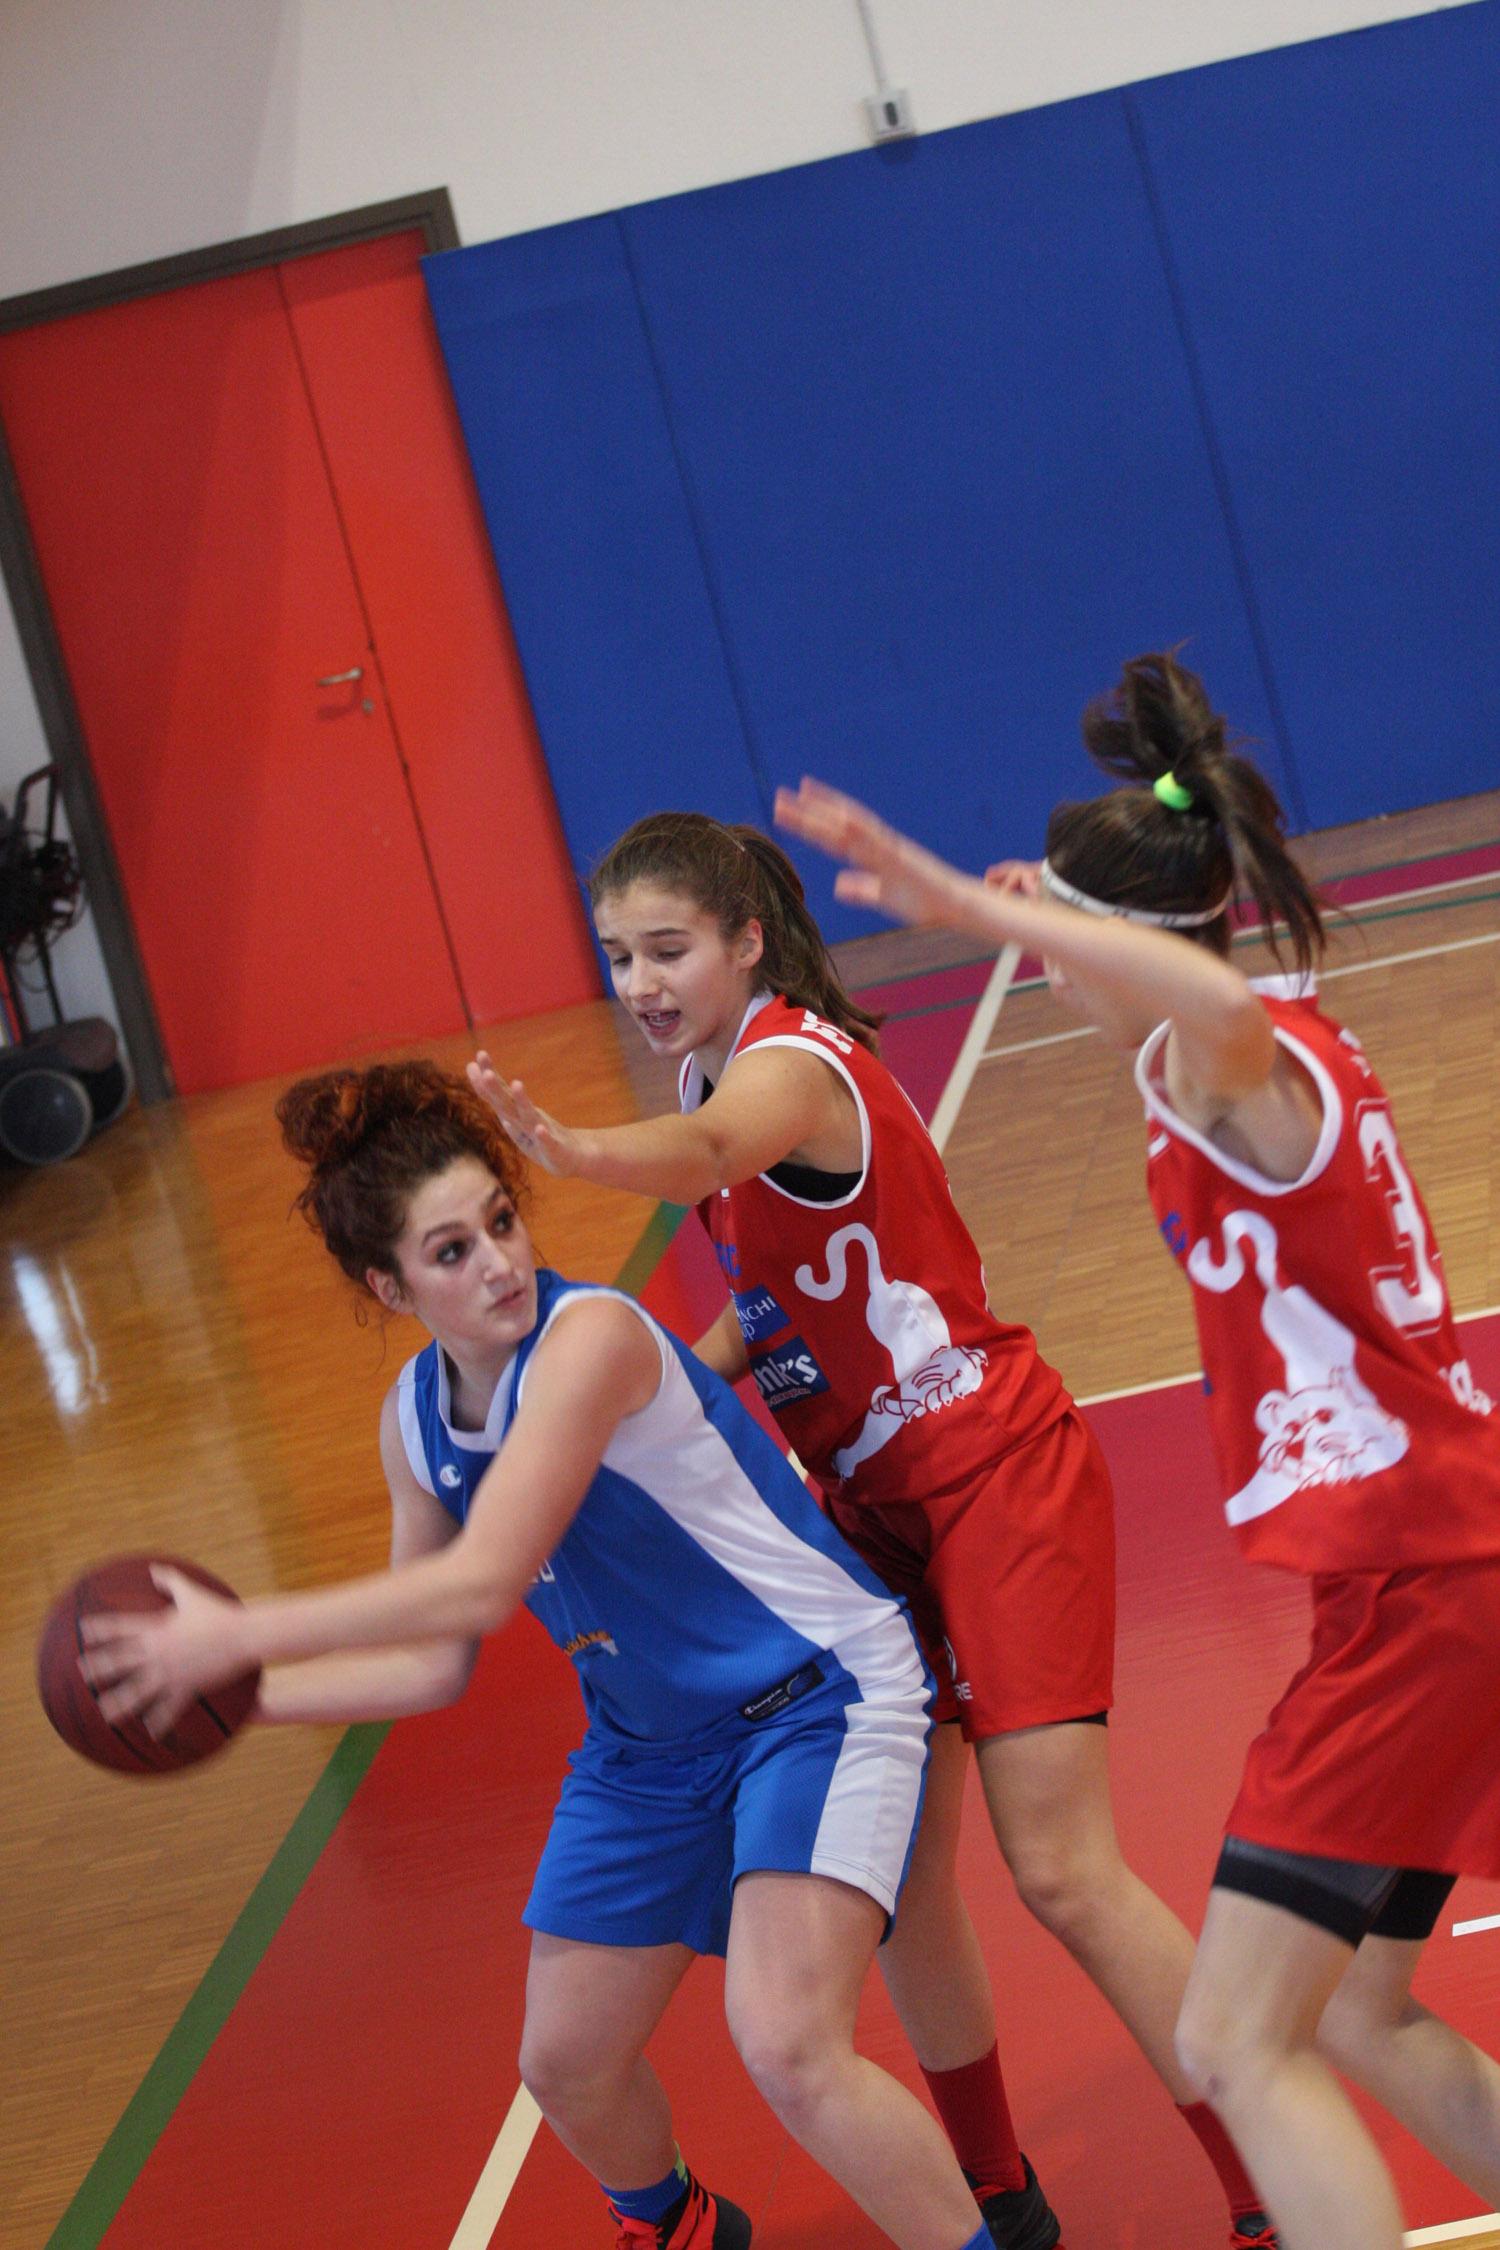 U16E - Costa Masnaga vs Baskettiamo Vittuone 2001 00017.jpg